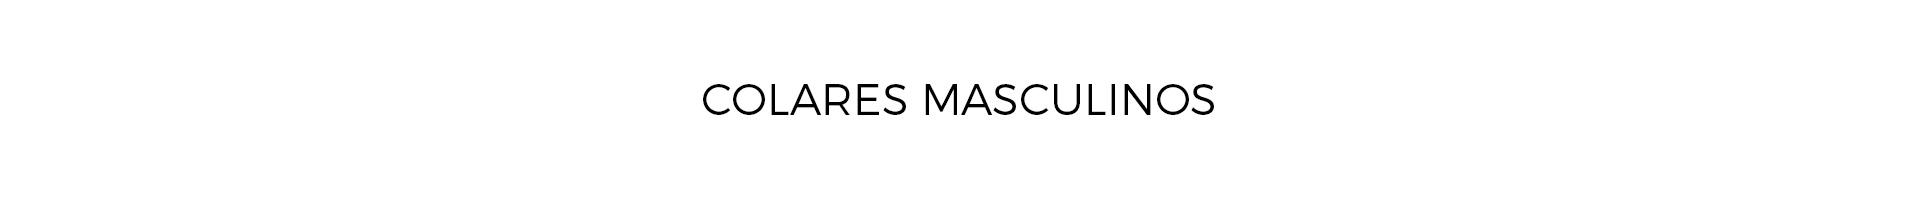 Colares Masculinos